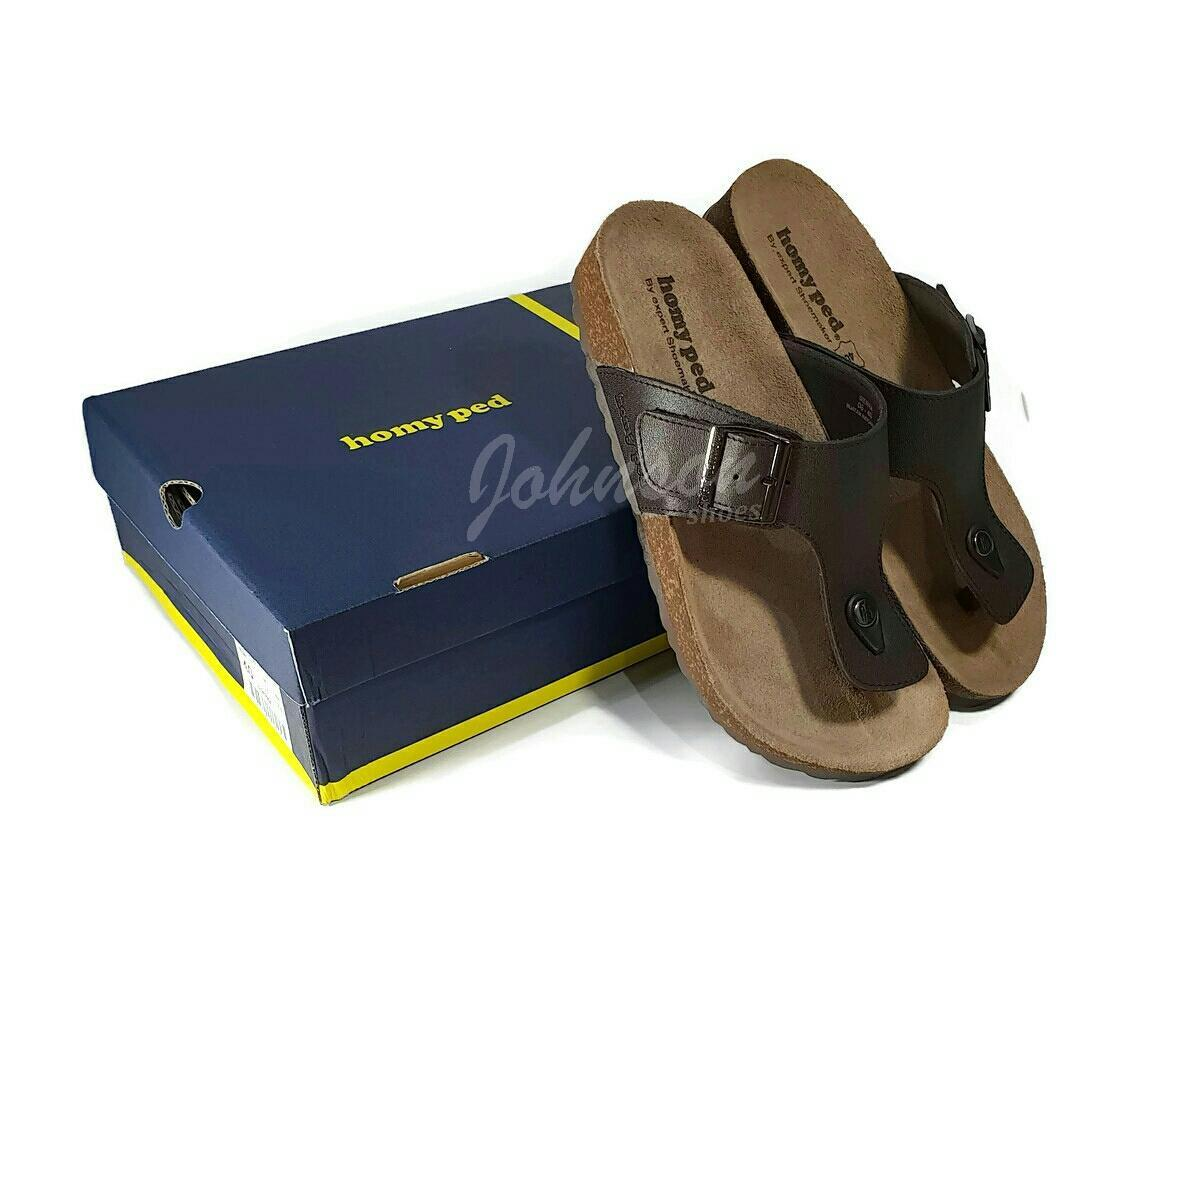 Johnson Shoes   Sandal Jepit Kulit Pria HOMYPED - SIERRA 06 BLACK dan  COFFEE 100 5e1c2b8e81